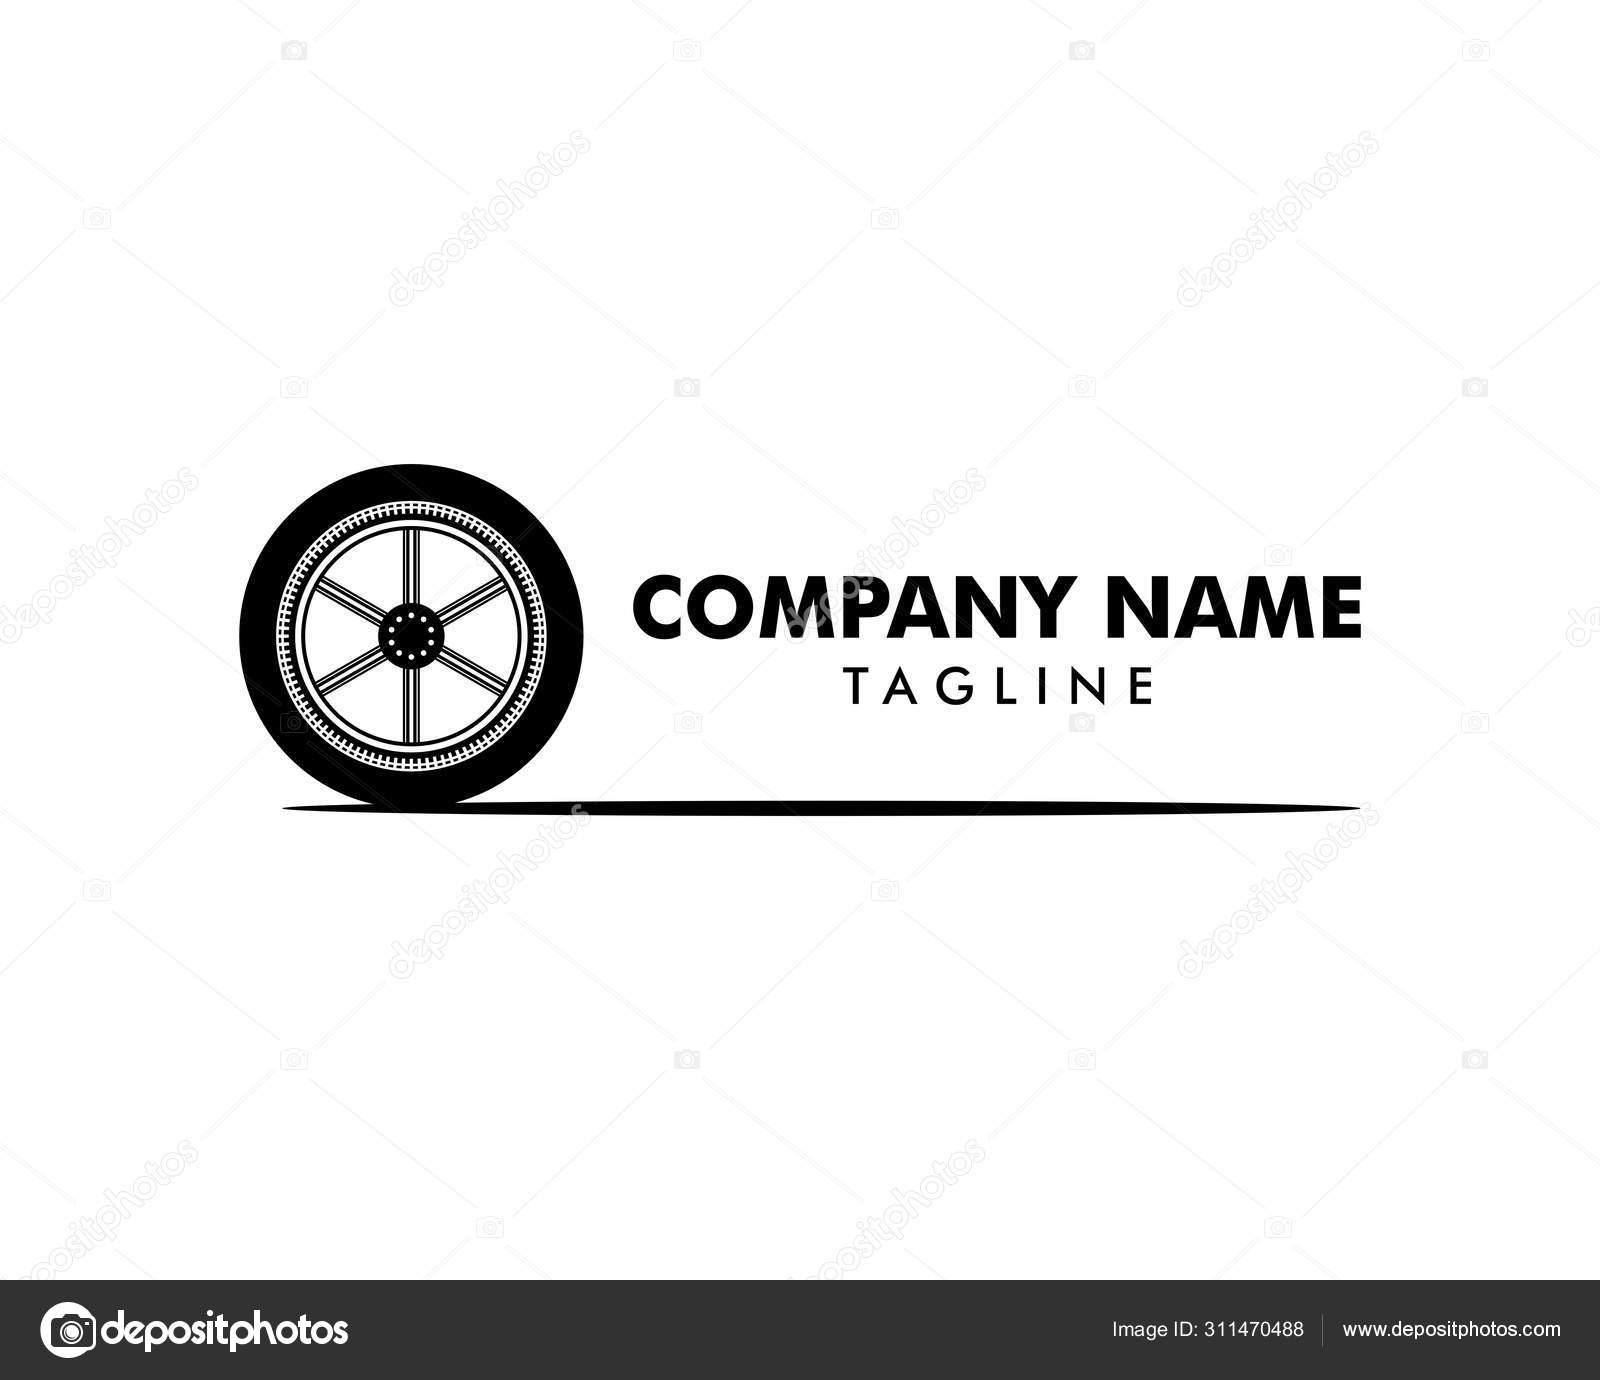 Automotive Tire Shop Logo Design Inspiracao Vector Vetores De Stock C Meisuseno Gmail Com 311470488